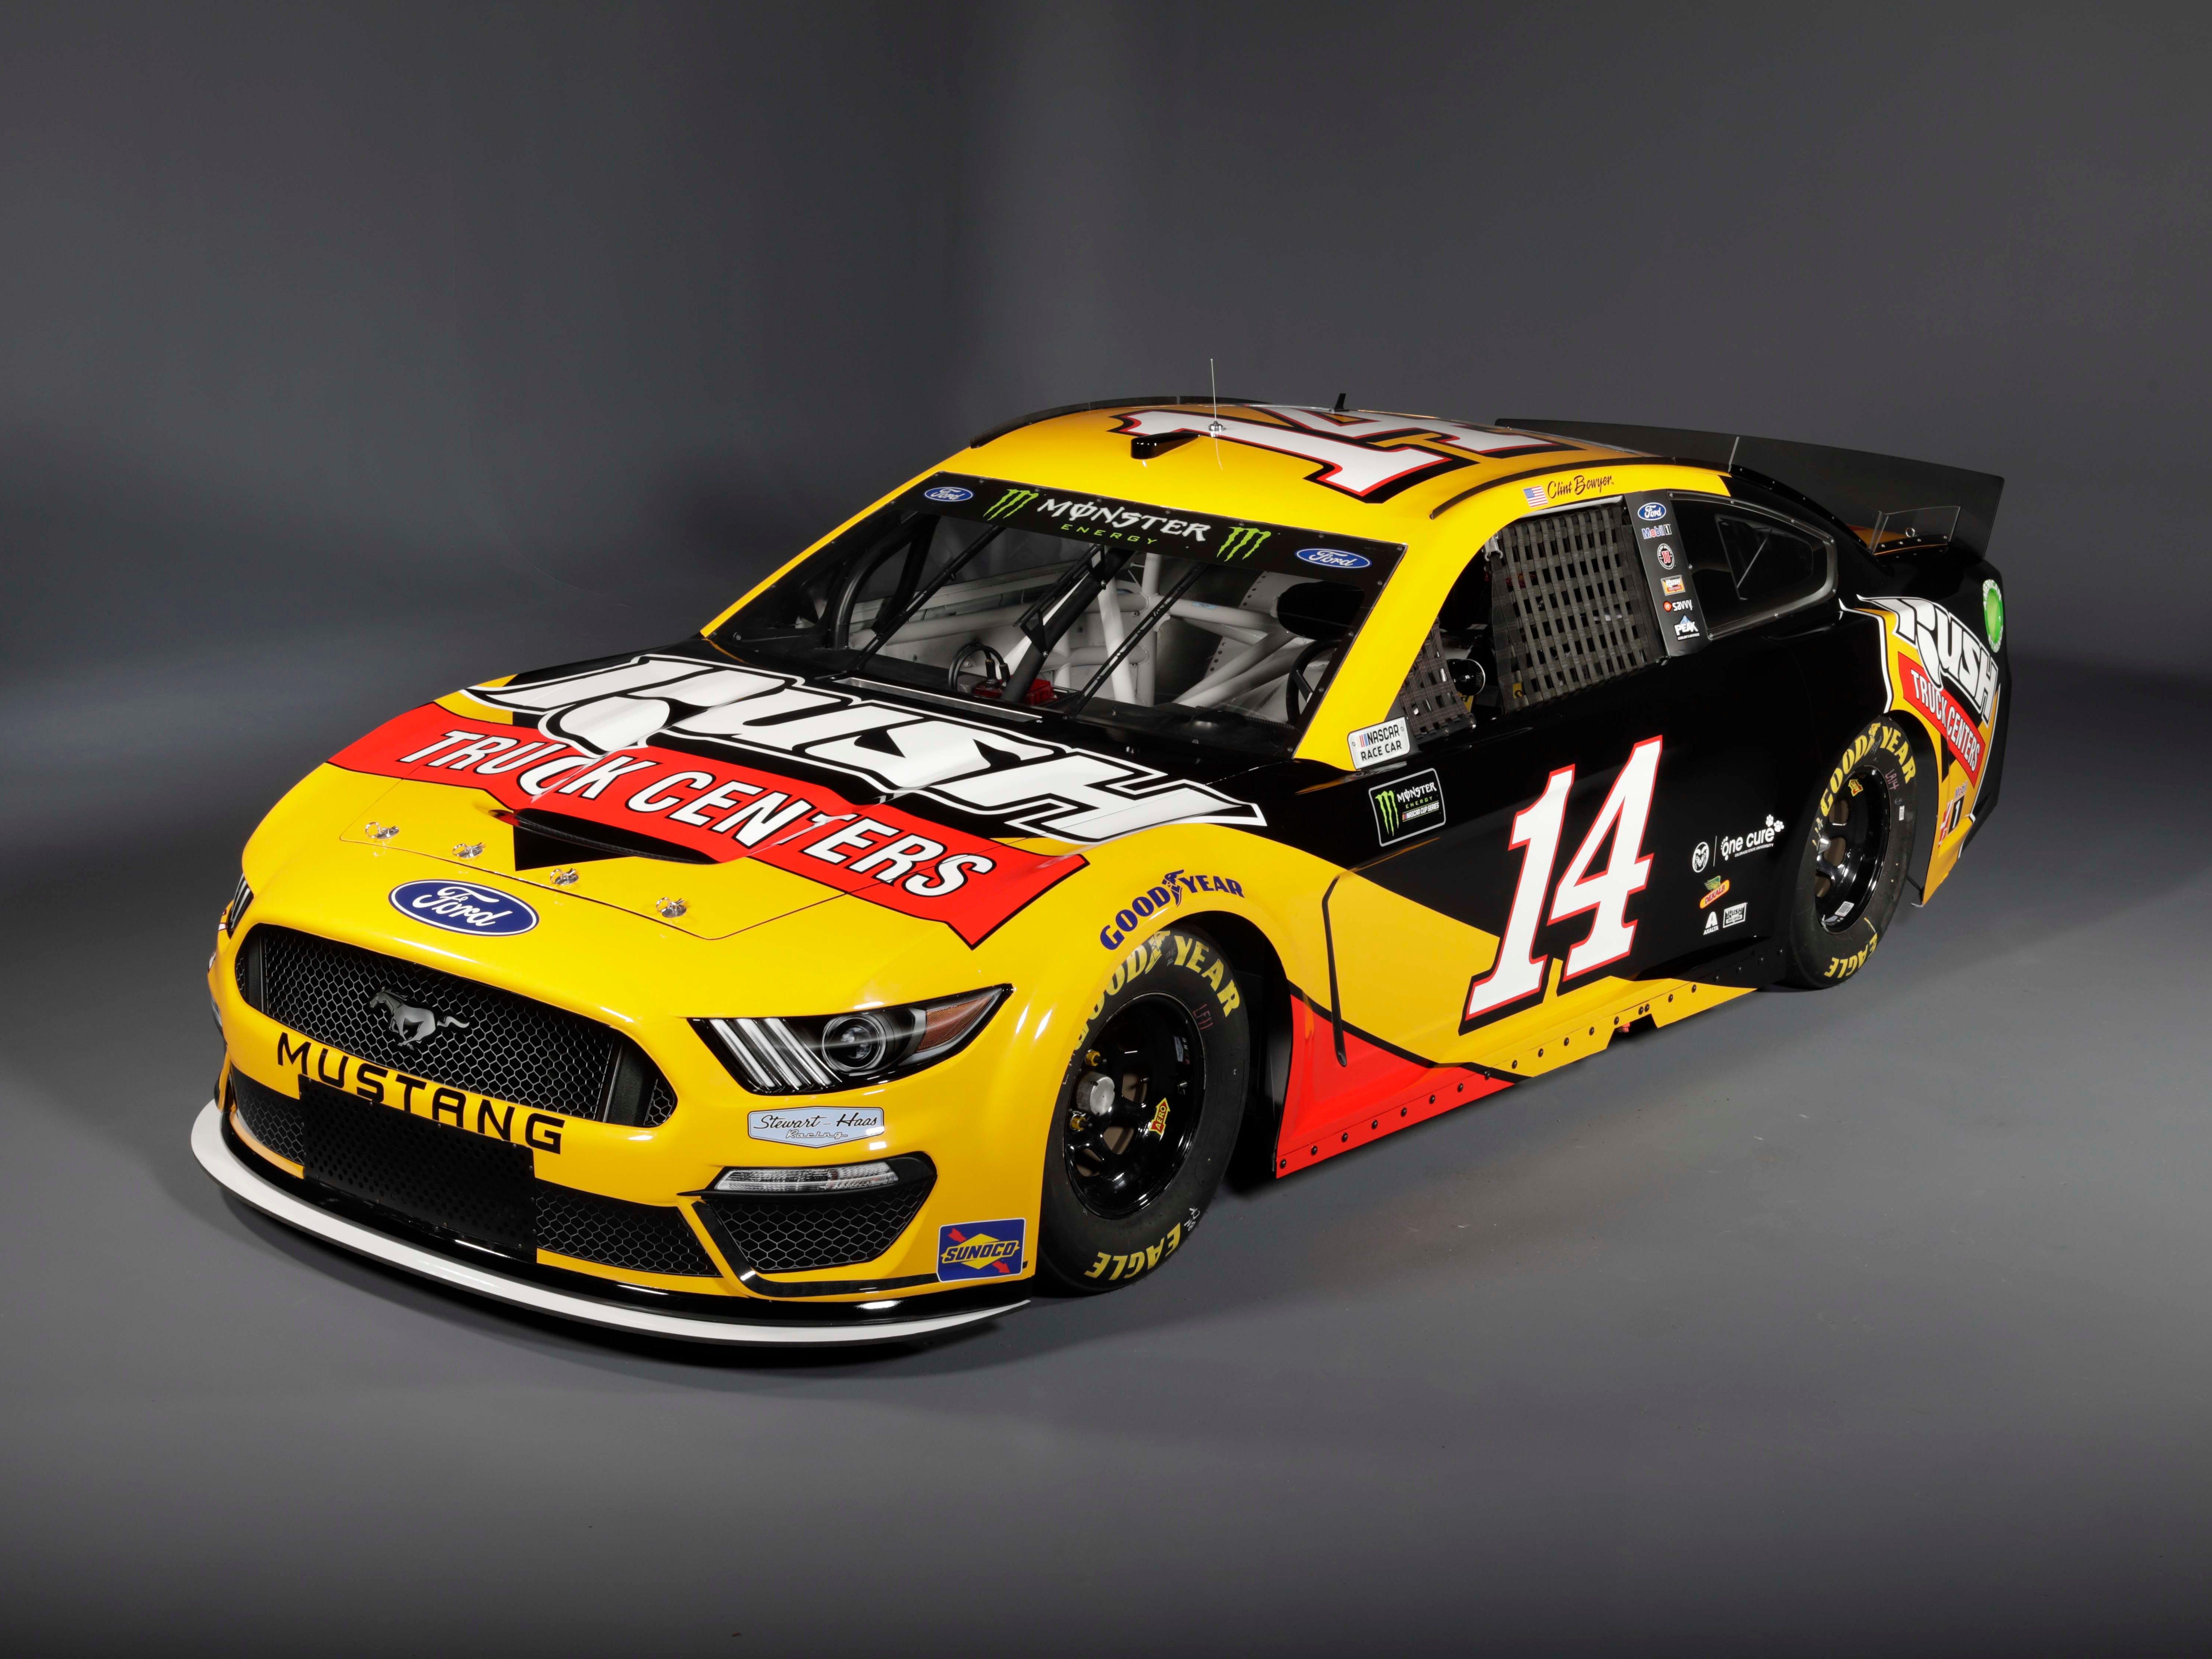 Stewart-Haas Racing NASCAR Mustang #14 of Clint Boyer.